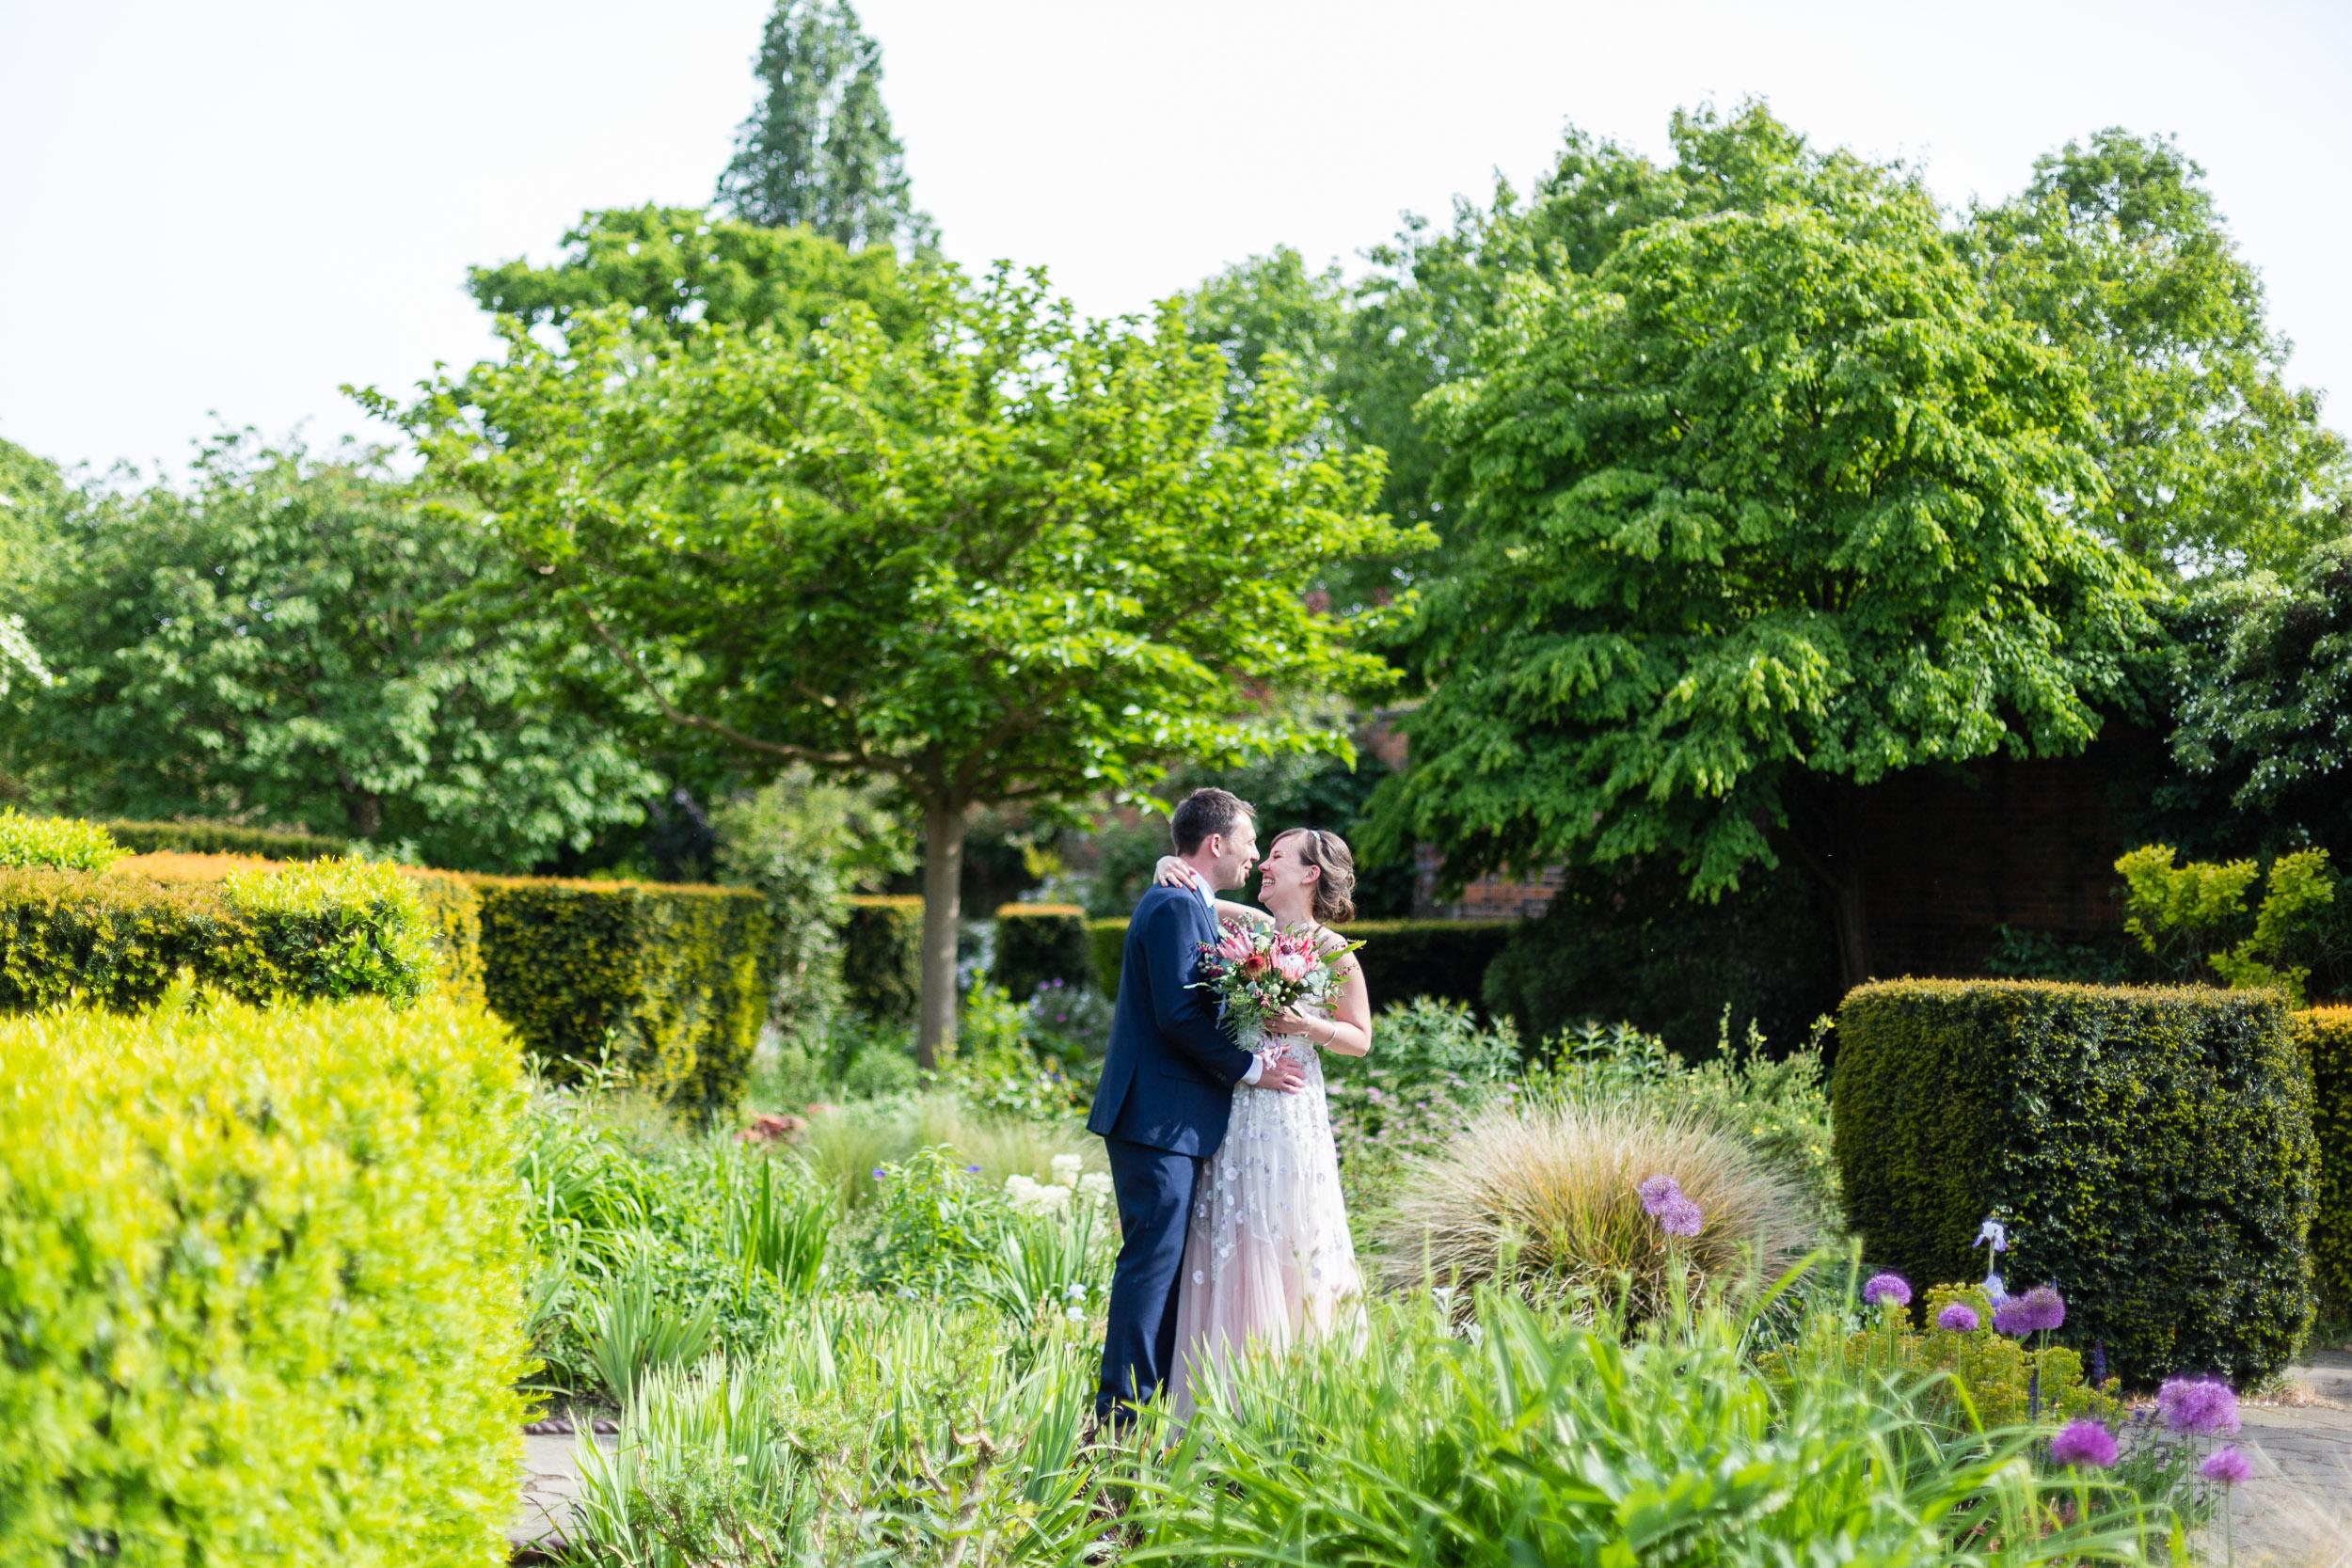 brockwell-lido-brixton-herne-hill-wedding-276.jpg